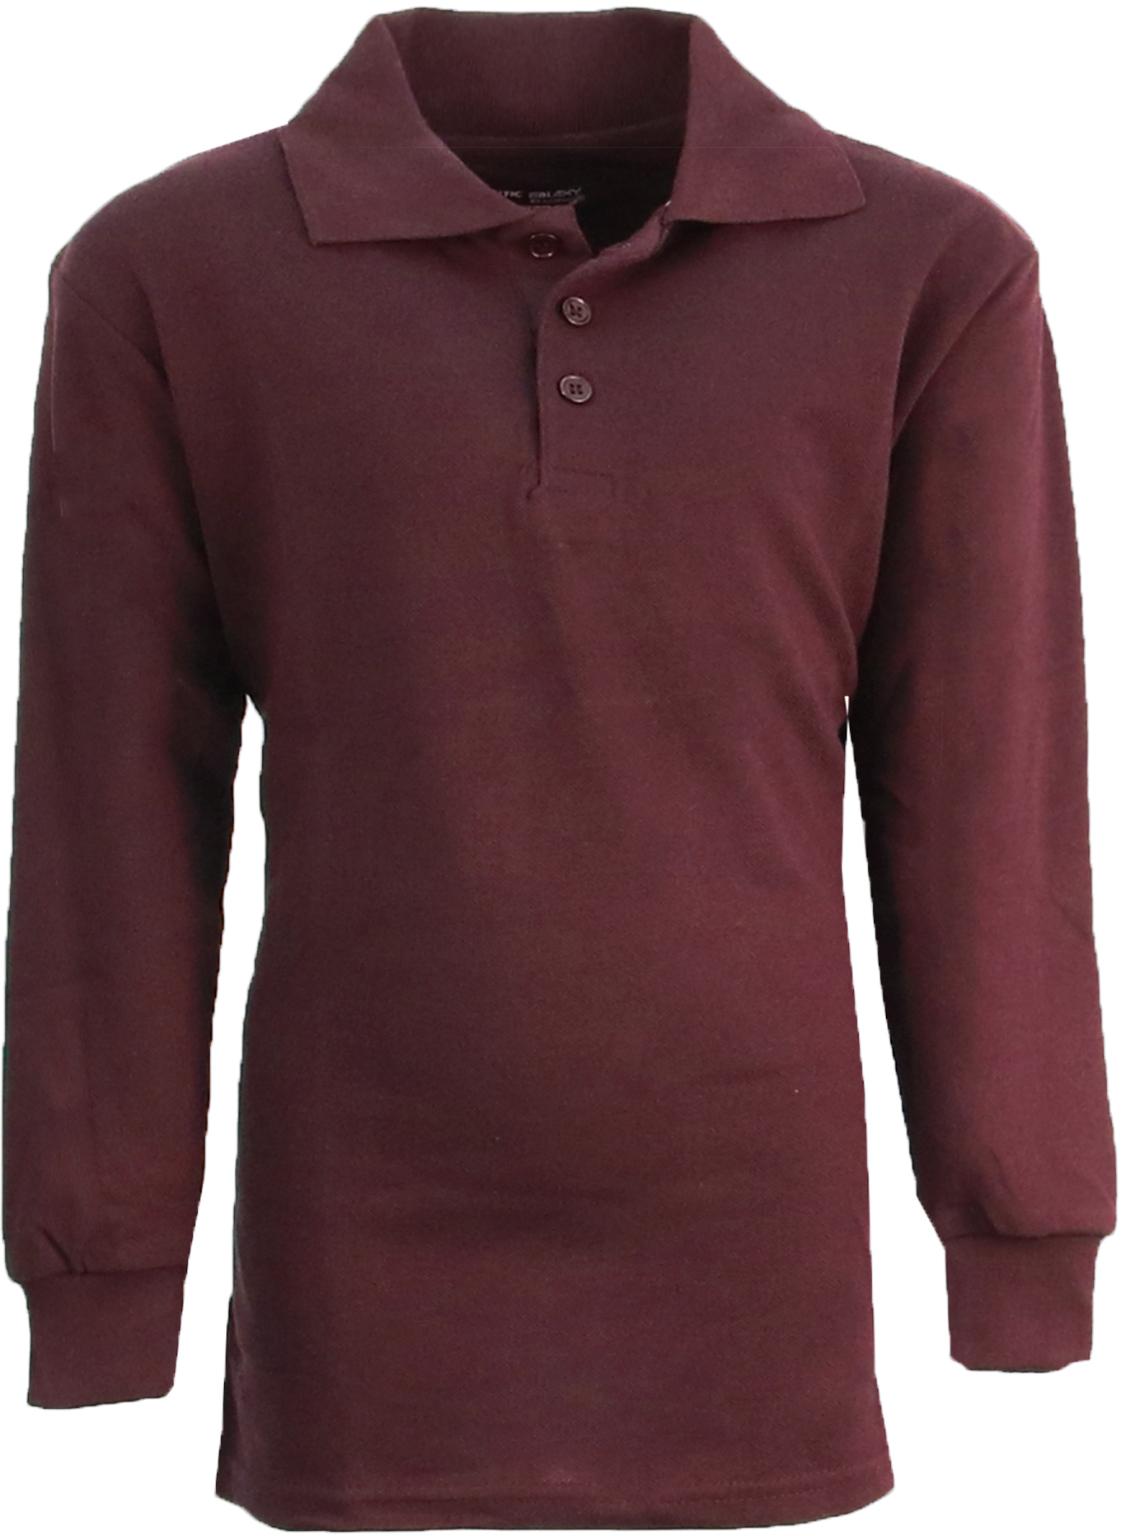 Wholesale boy 39 s burgundy long sleeve pique polo shirts Burgundy polo shirt boys